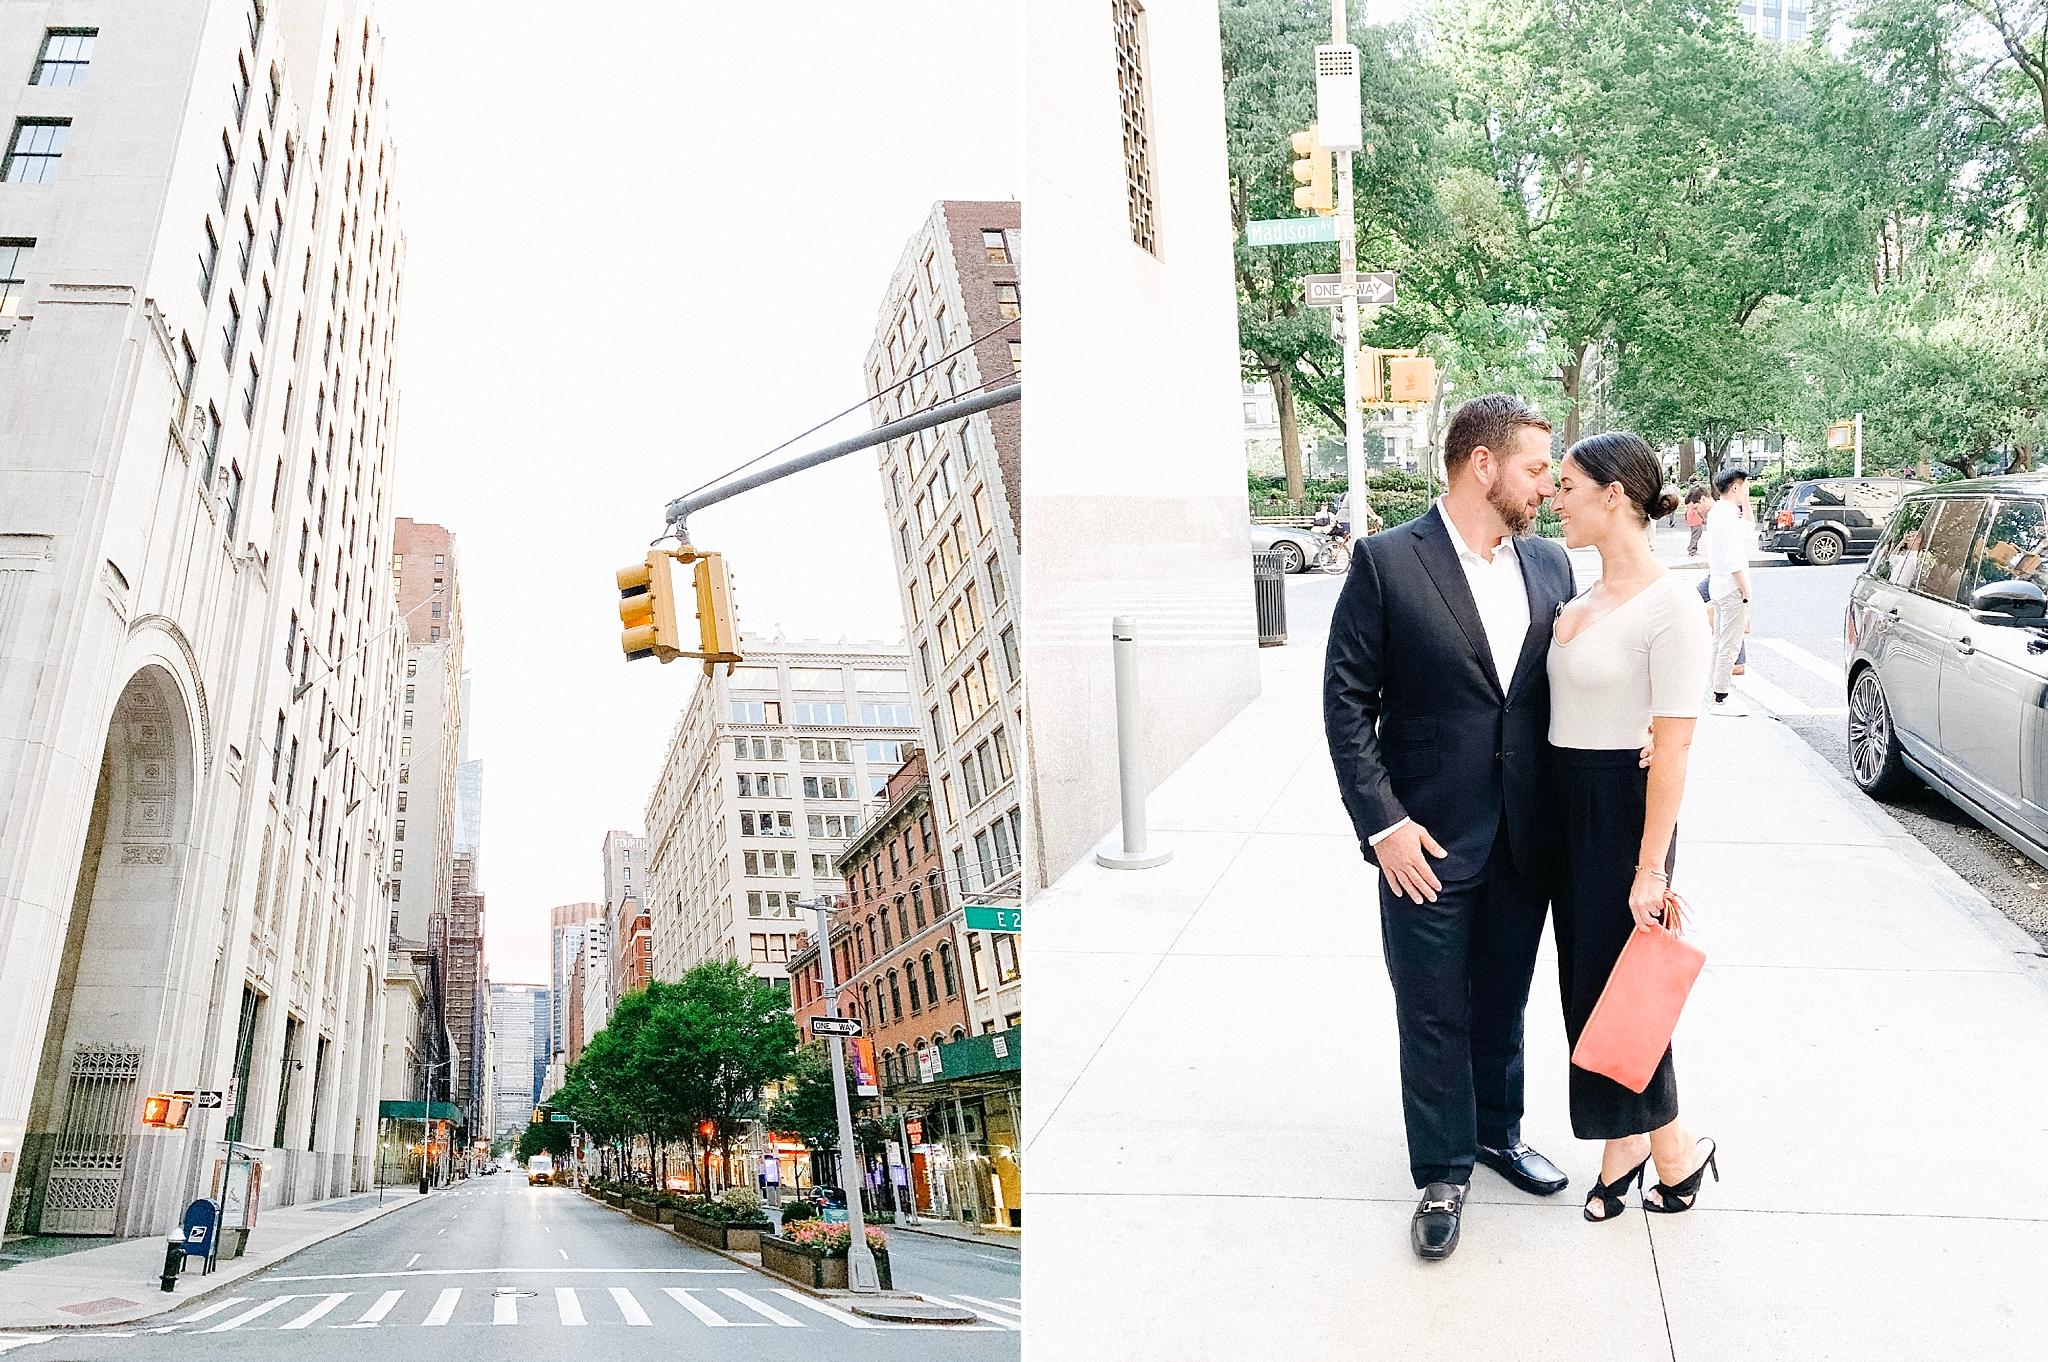 36 Hours in NYC_Cathy Durig_0007.jpg